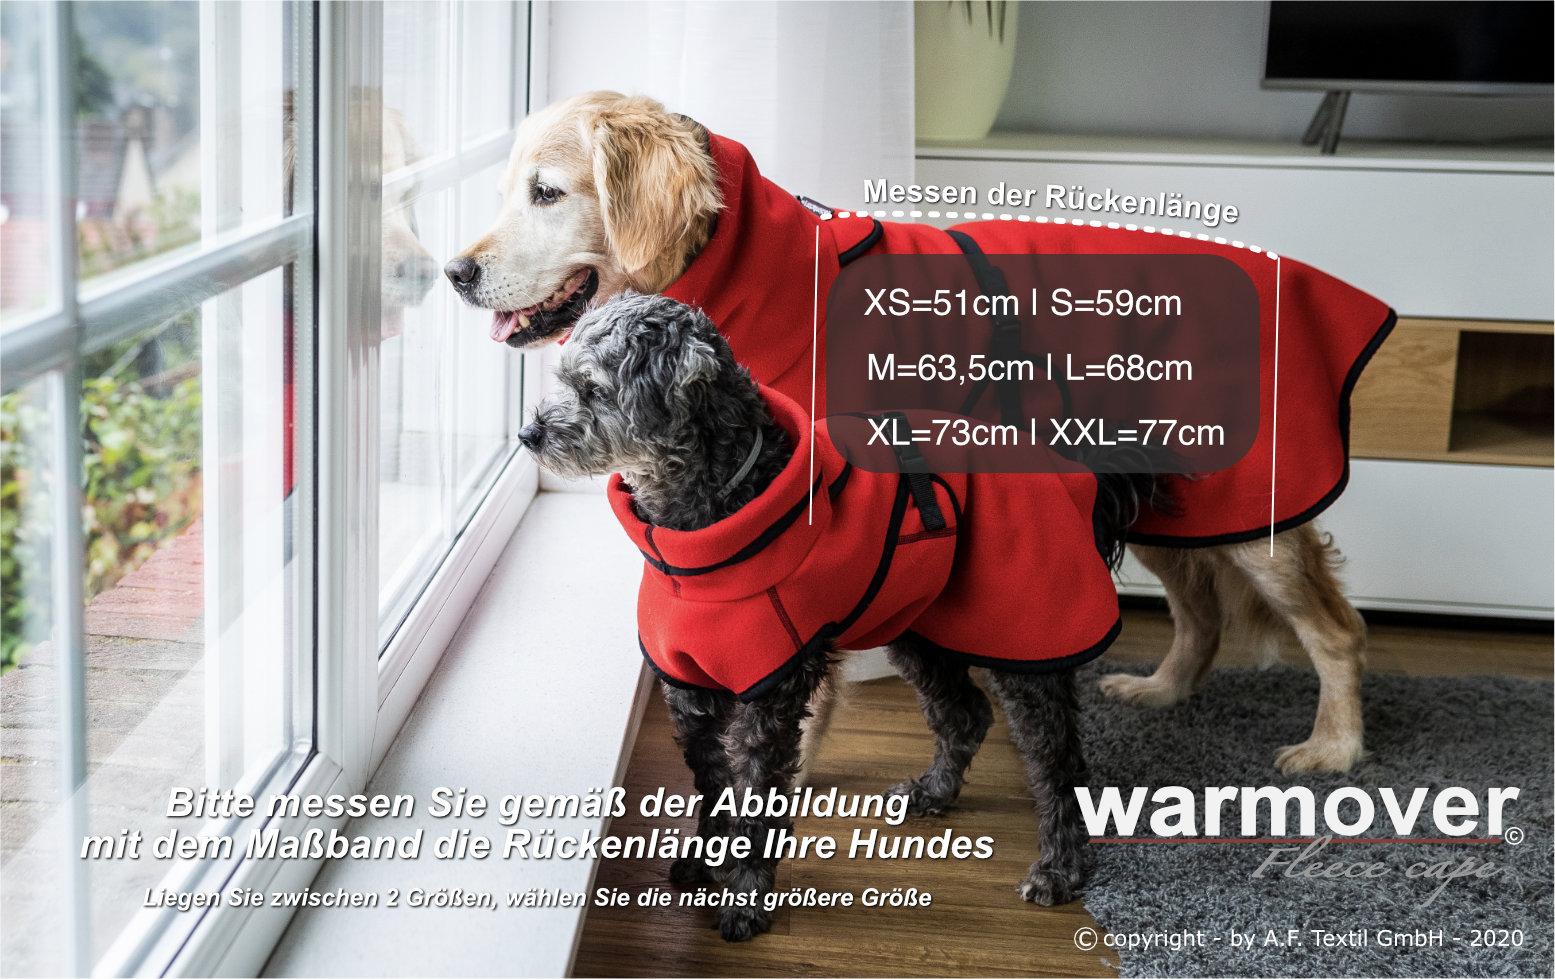 warmover-cape-gr-ssenfindung-deutschgjcjPFCVYBX3U